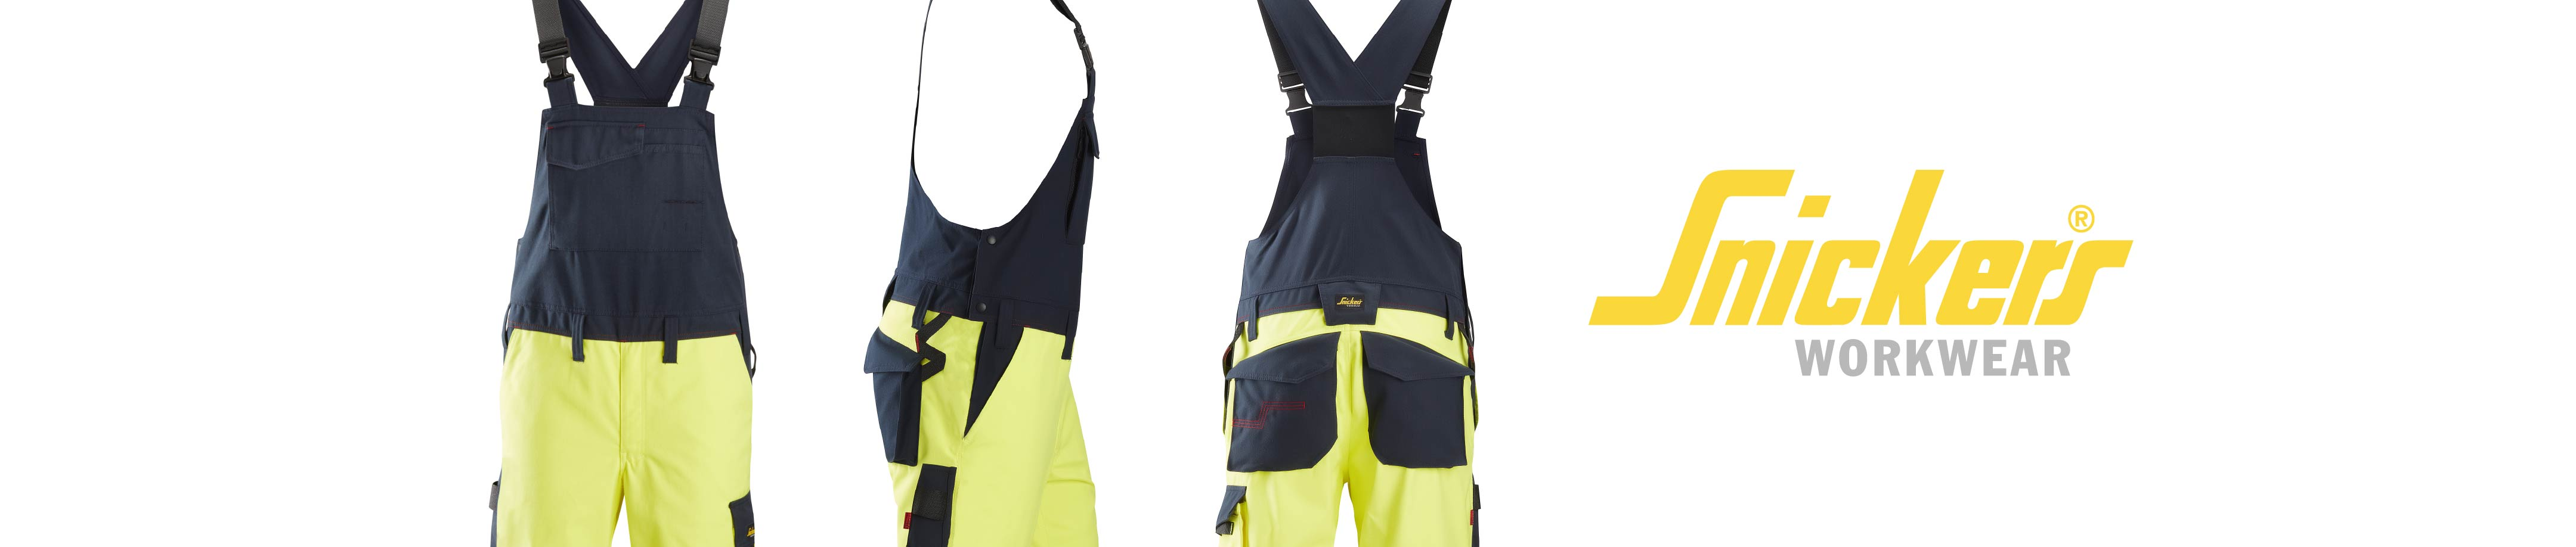 Flame retardant overalls